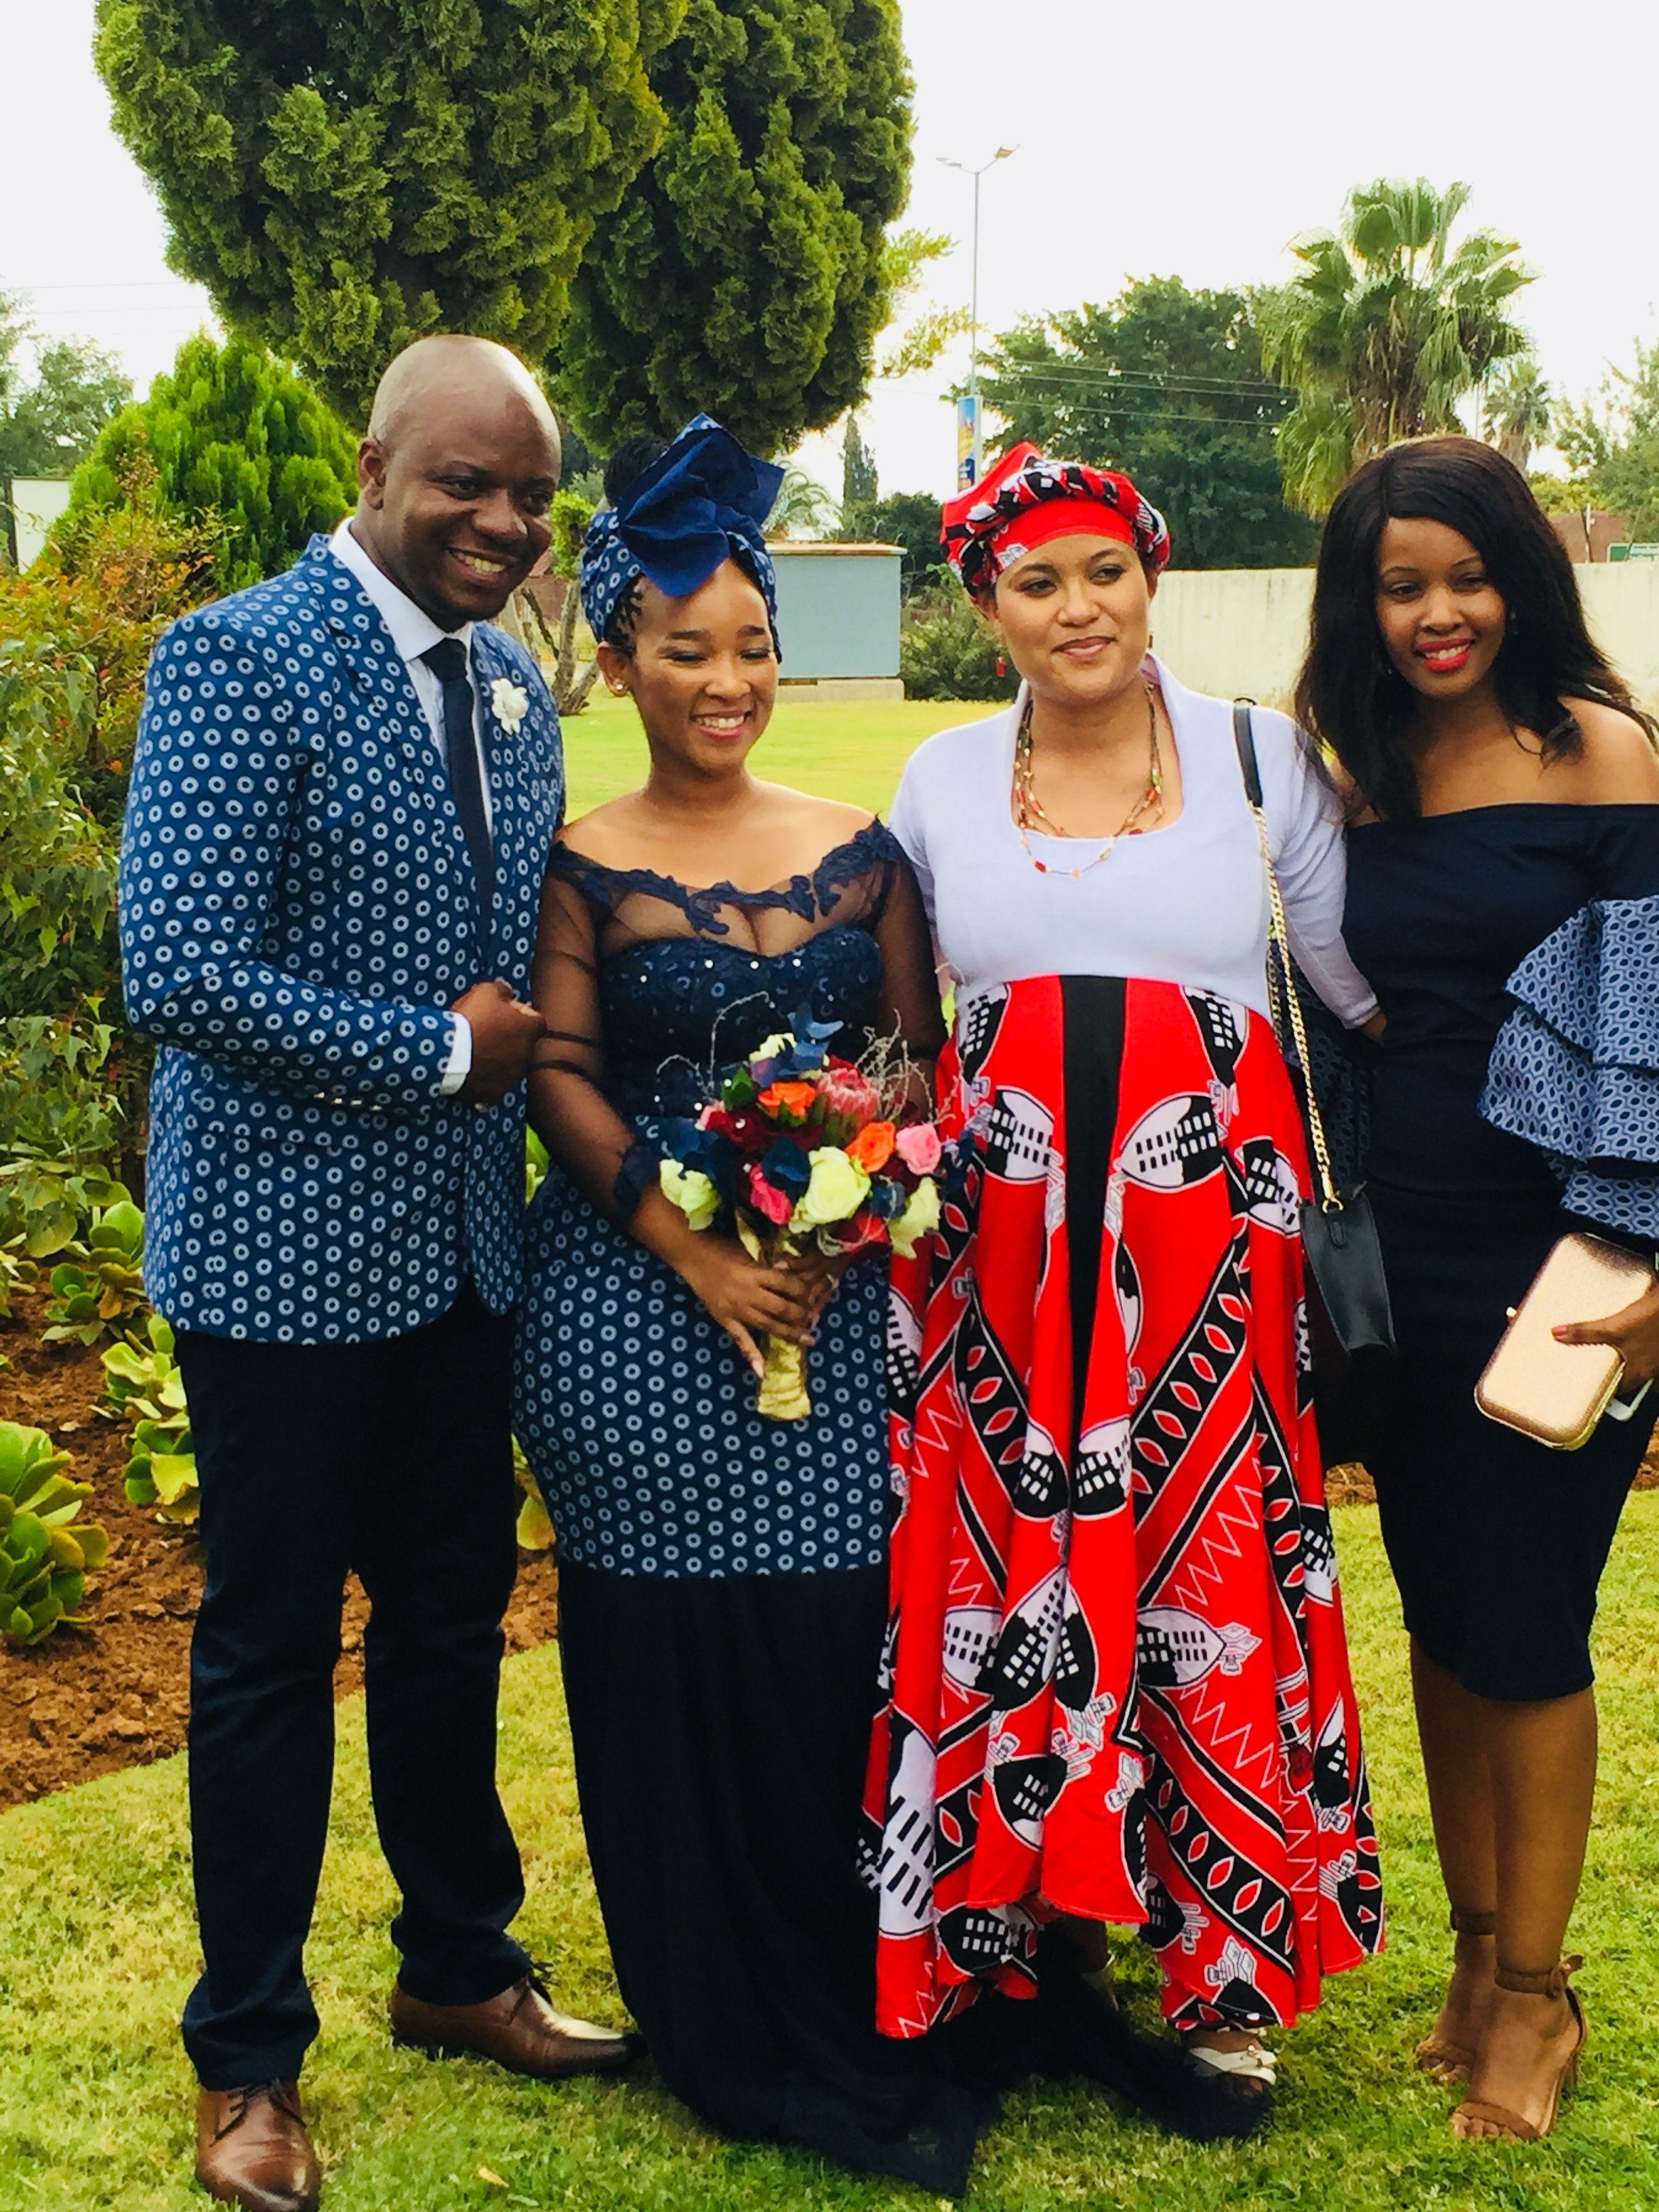 Shweshwe swati wedding attire wedding africanwedding southafrica